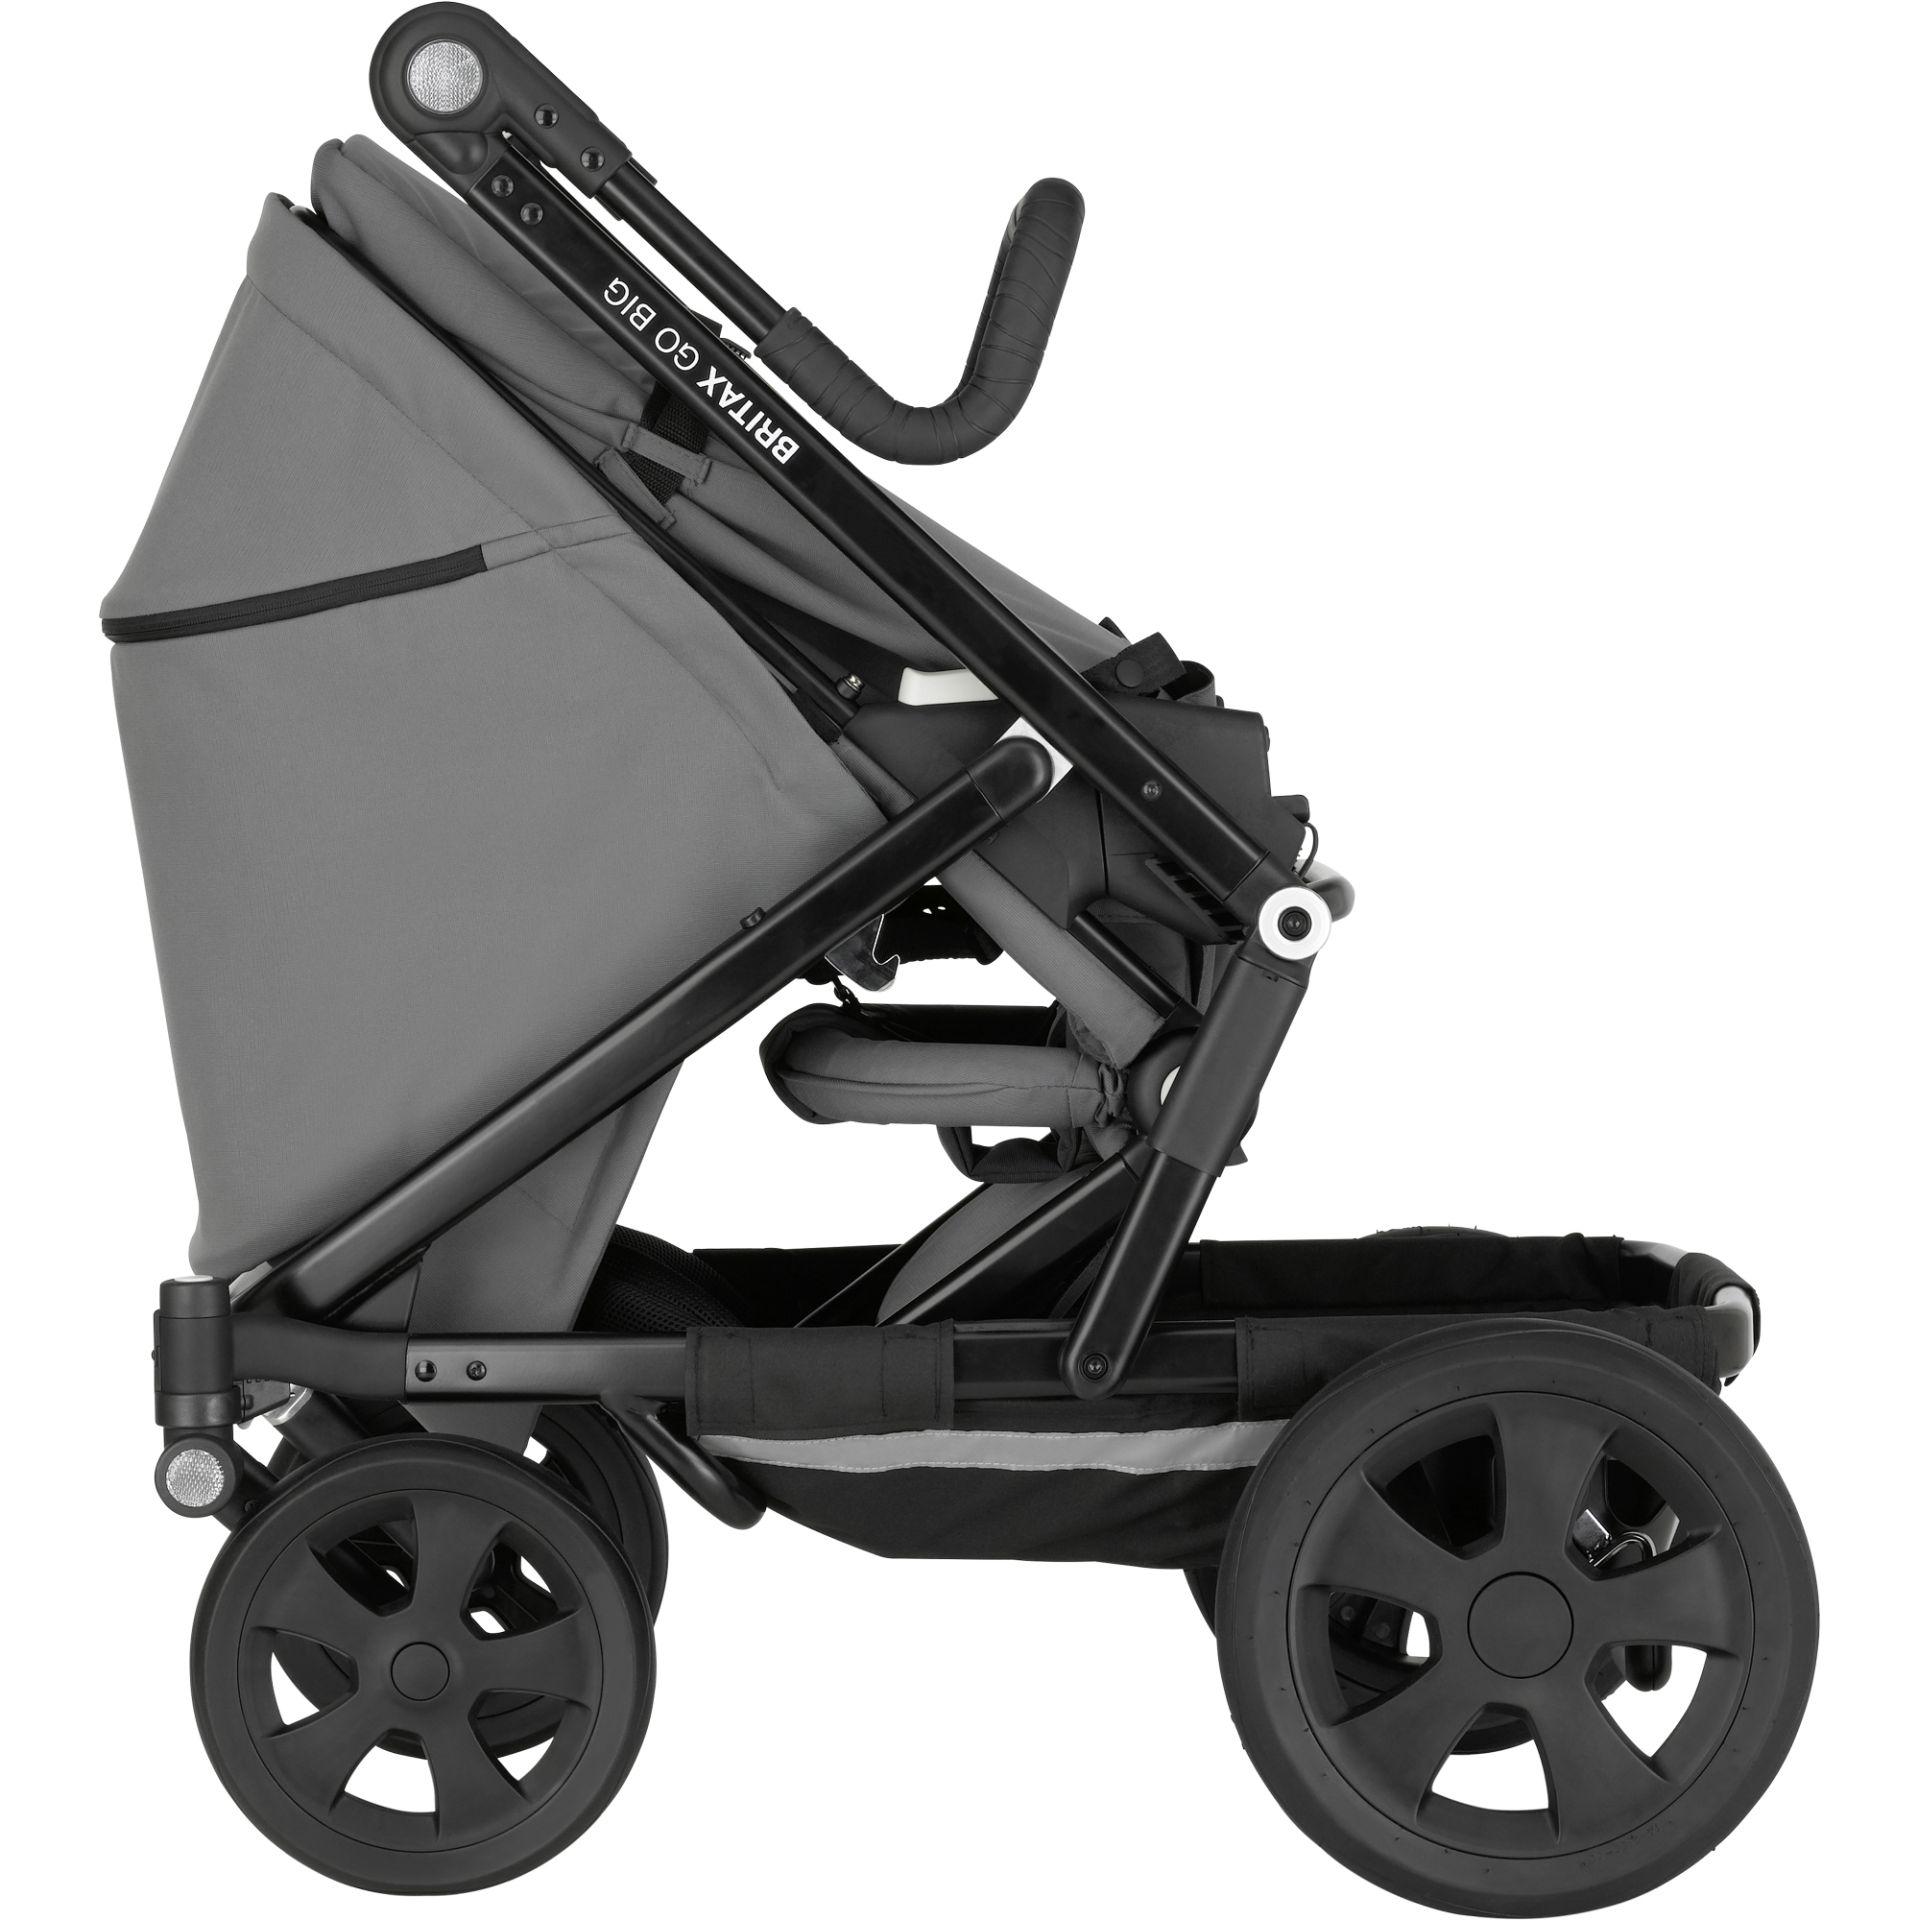 britax r mer kombikinderwagen go big 2 2018 steel grey go big online kaufen bei kidsroom. Black Bedroom Furniture Sets. Home Design Ideas